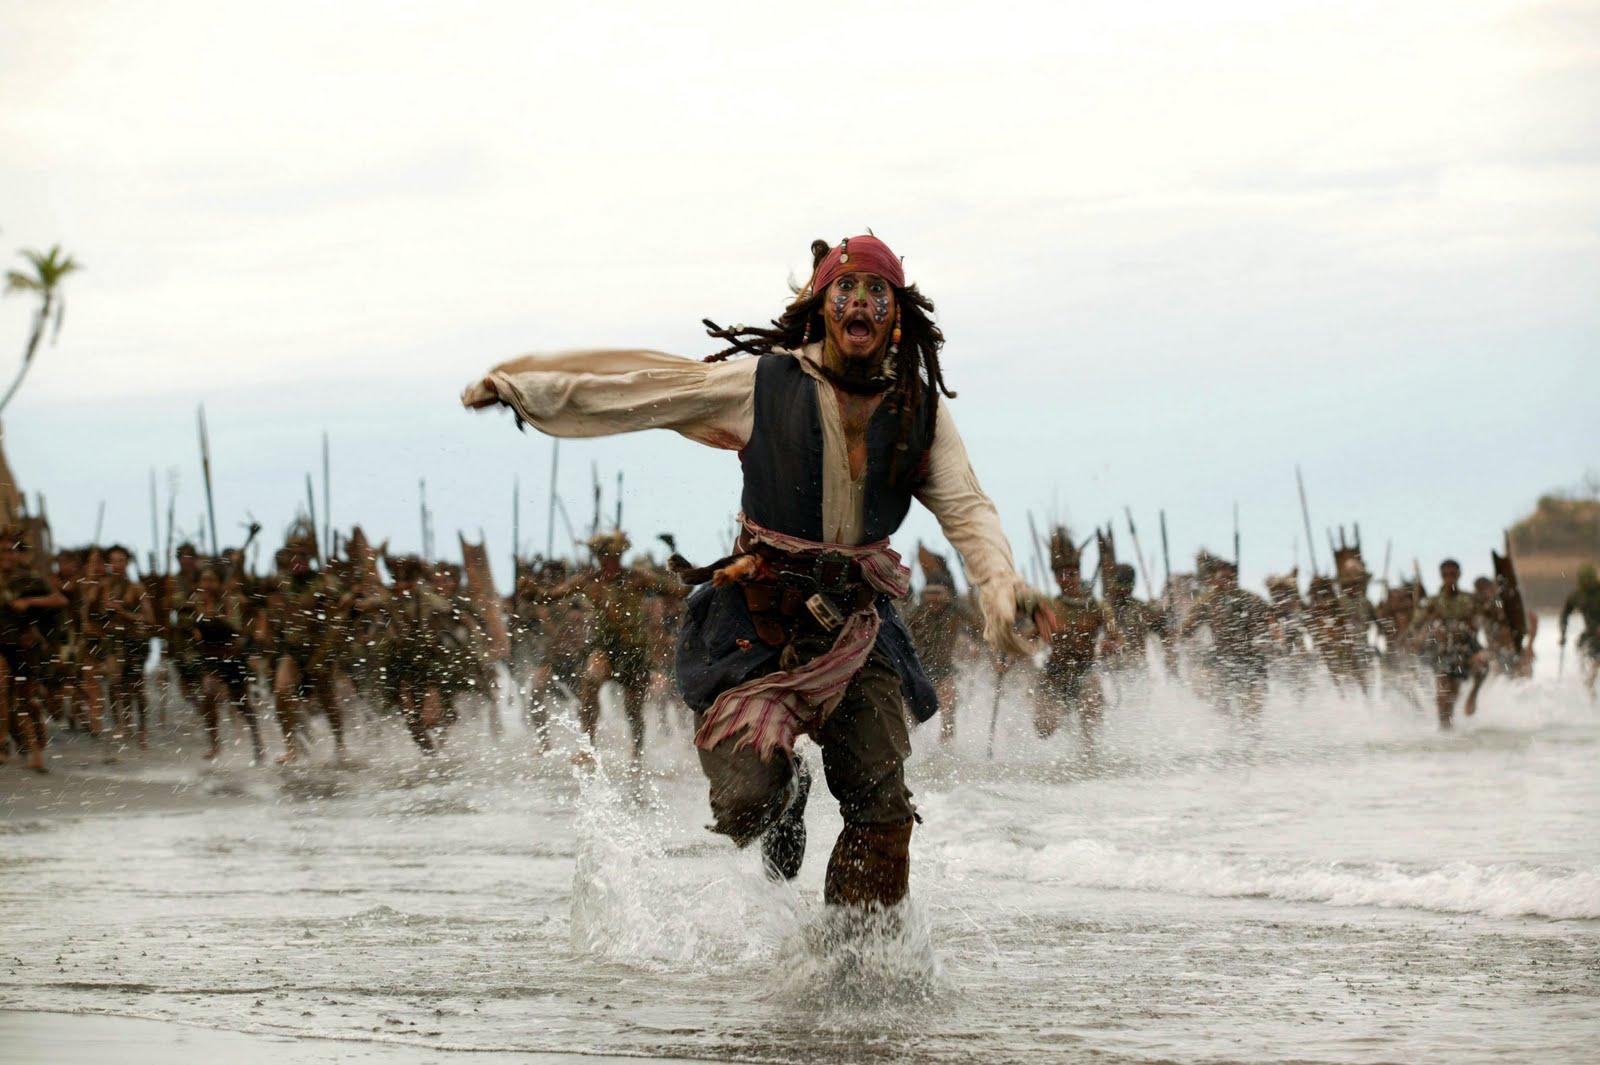 http://2.bp.blogspot.com/_wg3BmAj-bsI/SpINk5XKIJI/AAAAAAAAK5I/R-qdmj2dduo/s1600/piratas-do-caribe-o-ba-da-morte-1.jpg